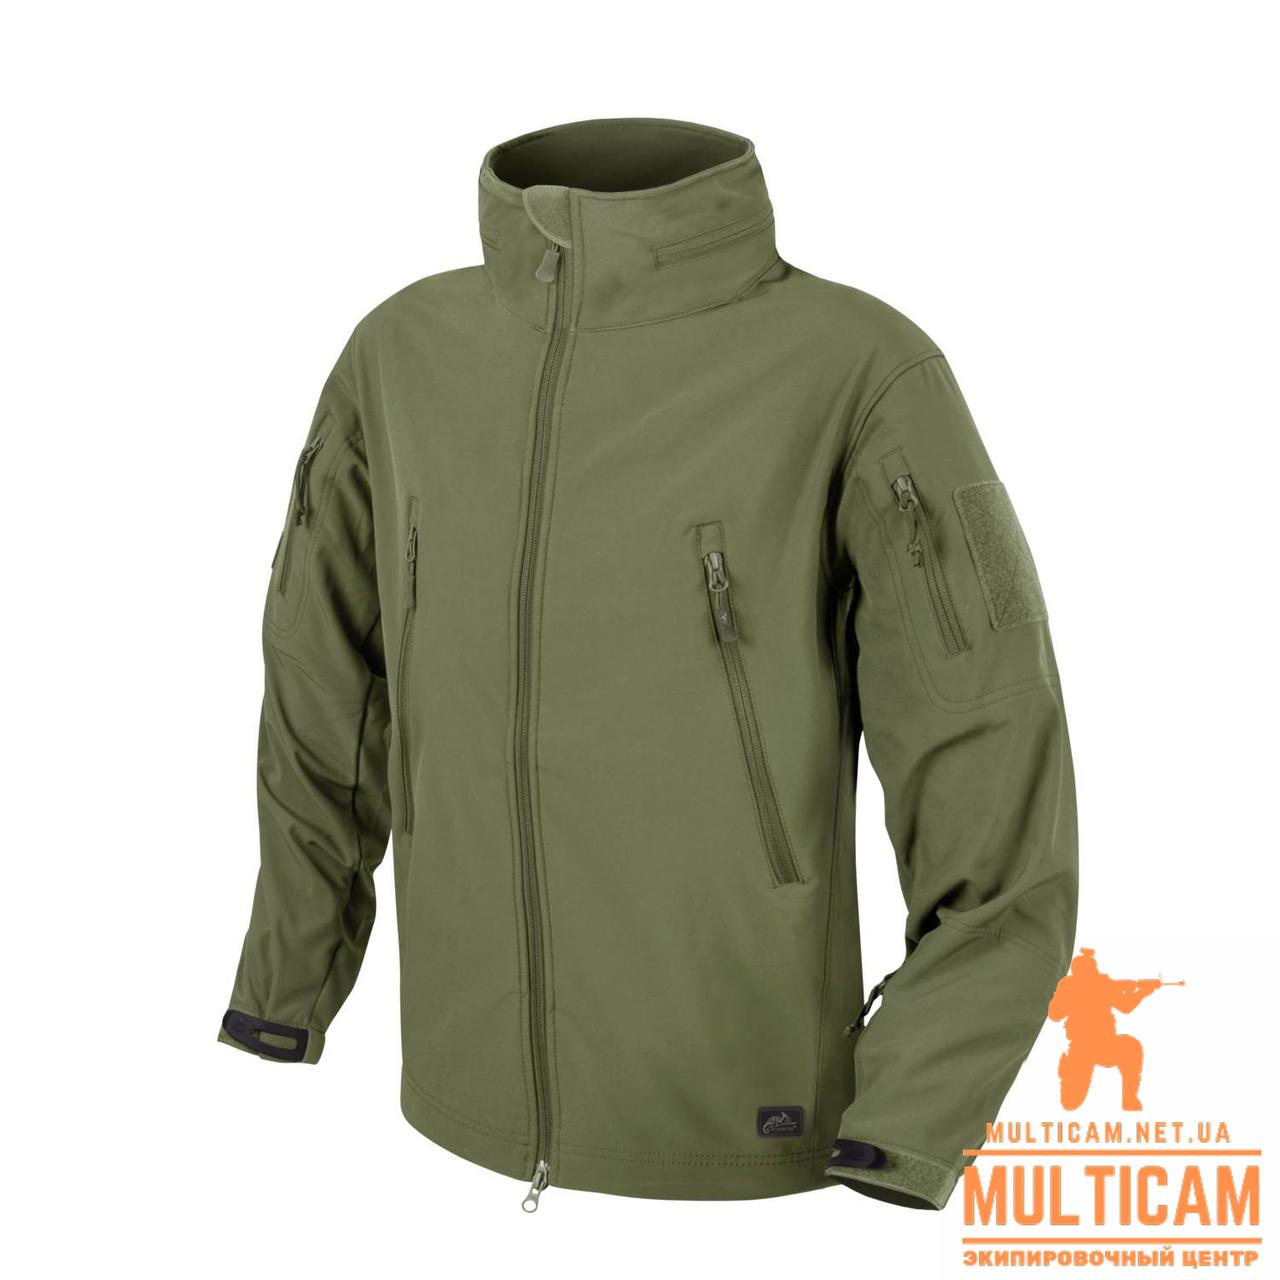 Куртка Helikon-Tex® GUNFIGHTER Jacket - Shark Skin Windblocker - Olive Green